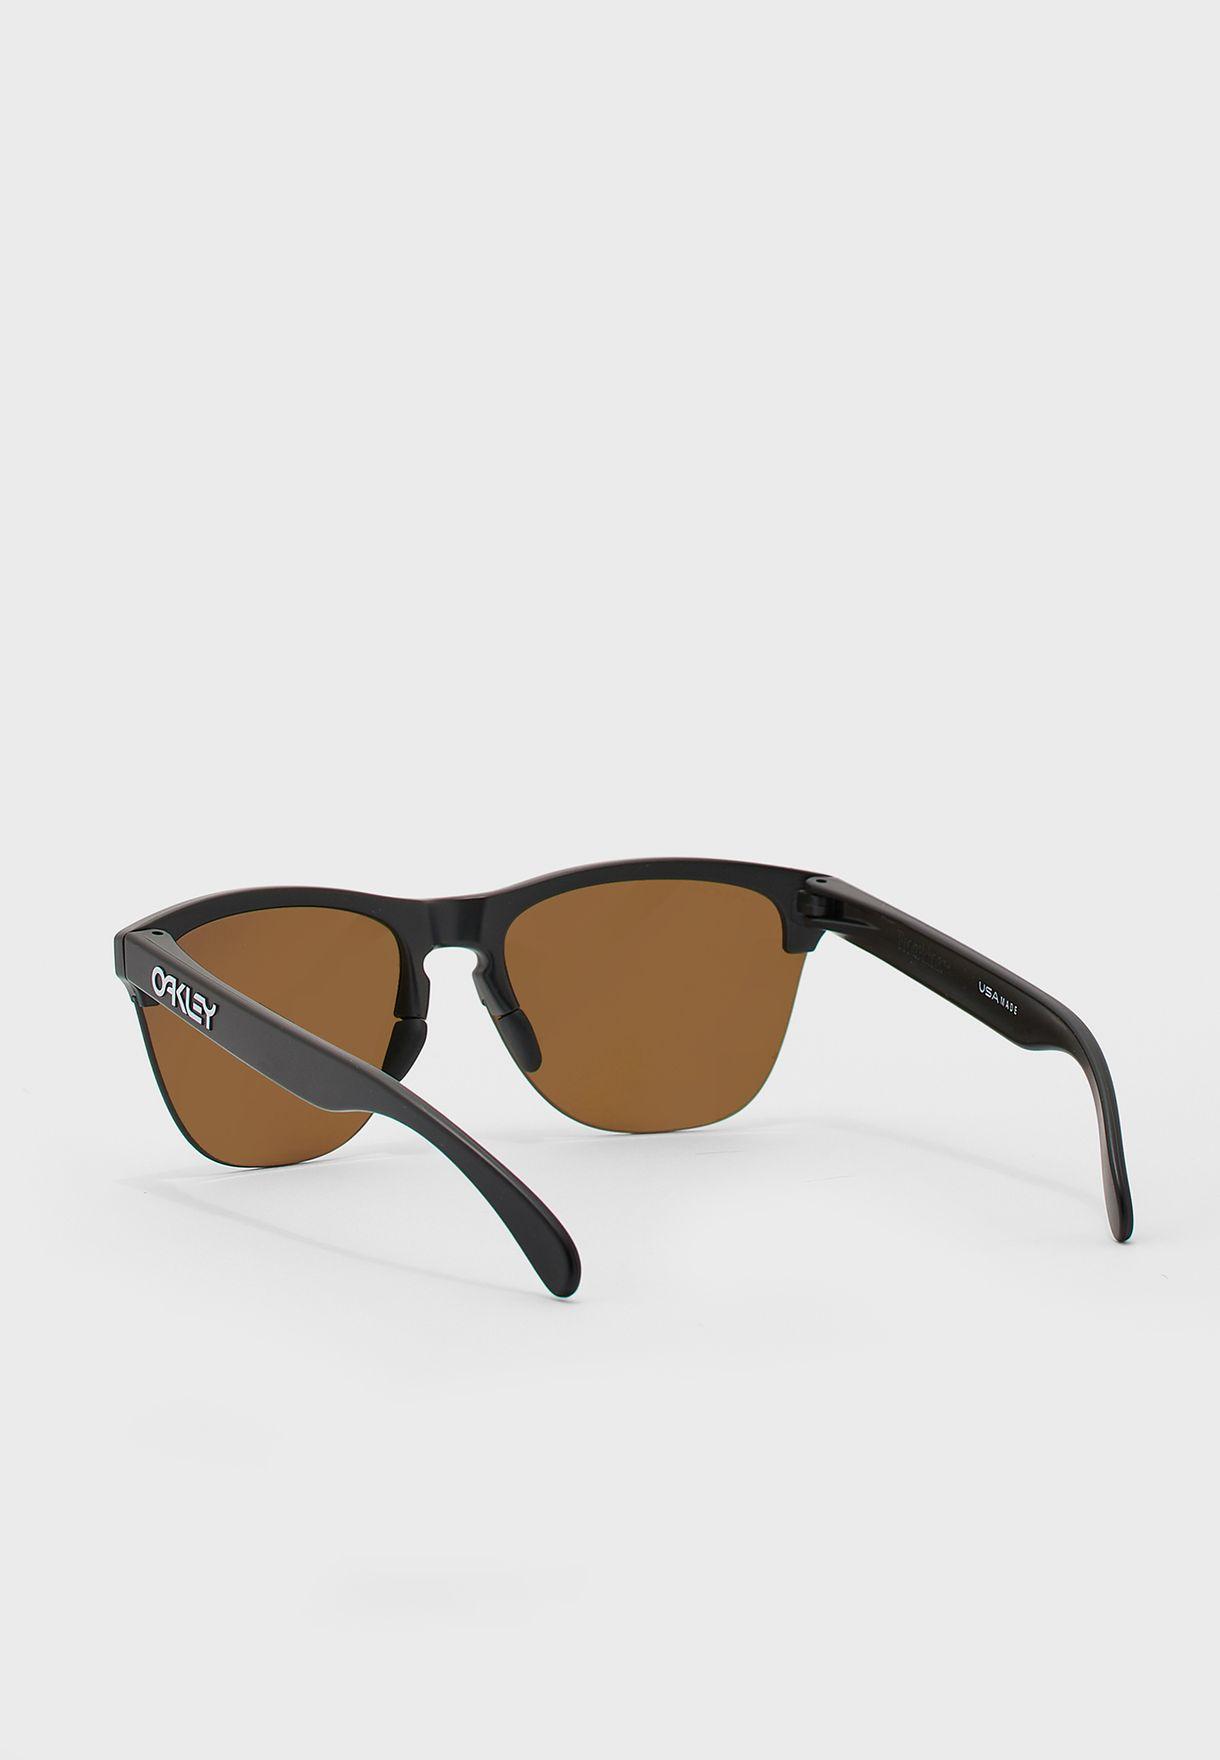 0OO9374 FROGSKINS® LITE Round Sunglasses